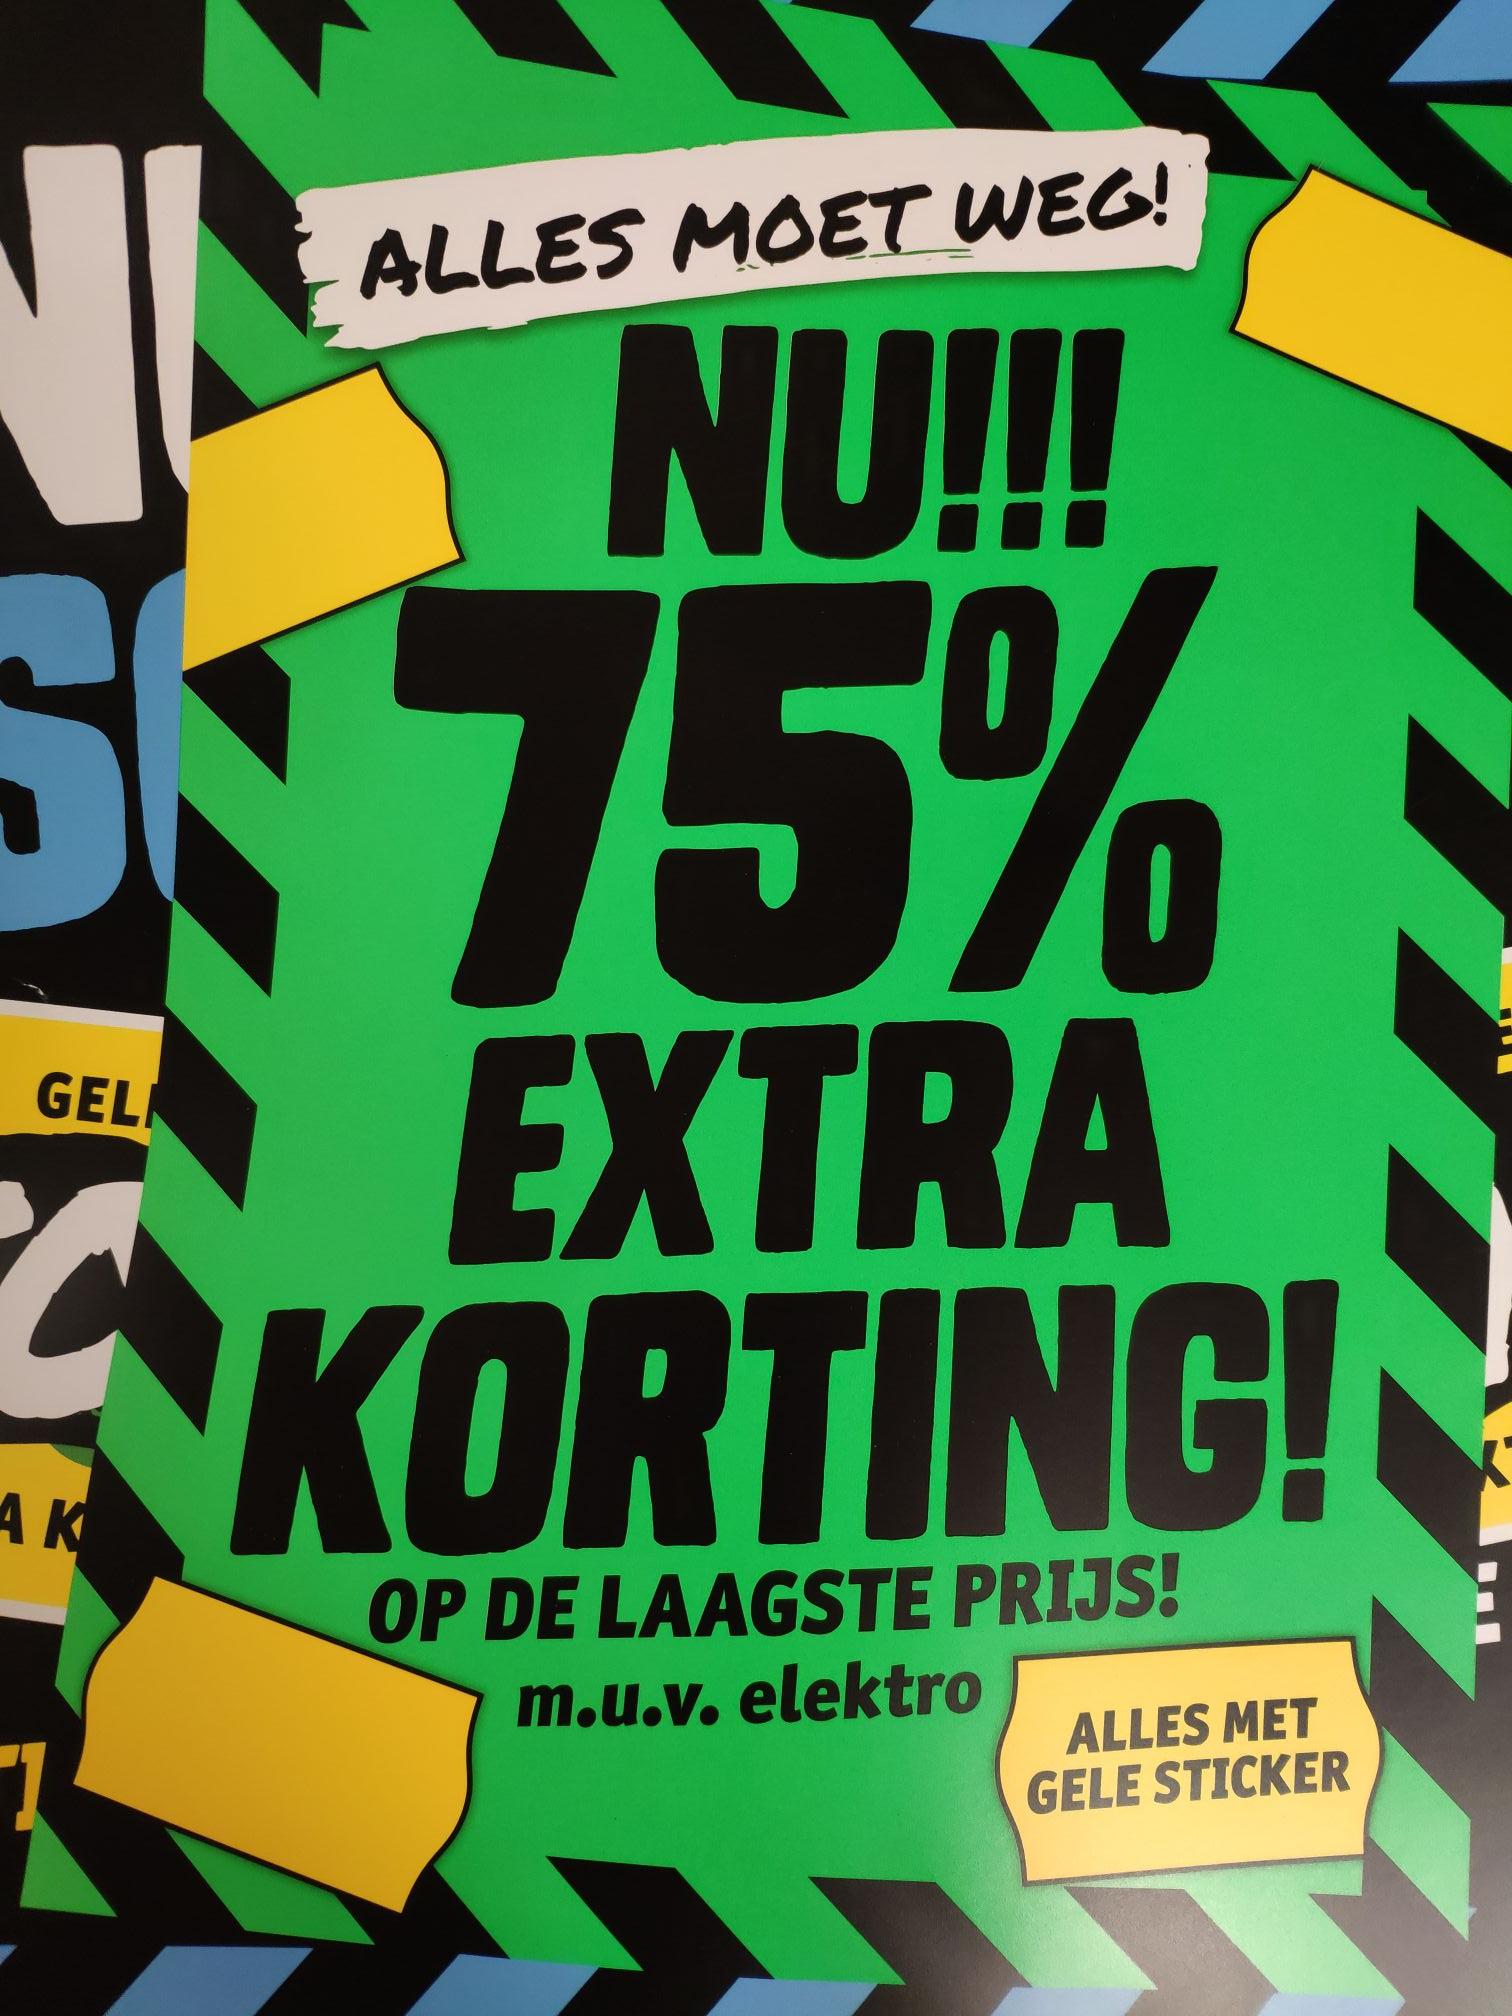 [Grensdeal België] Alles 75% korting in sale (muv electro), vanaf 29 juli